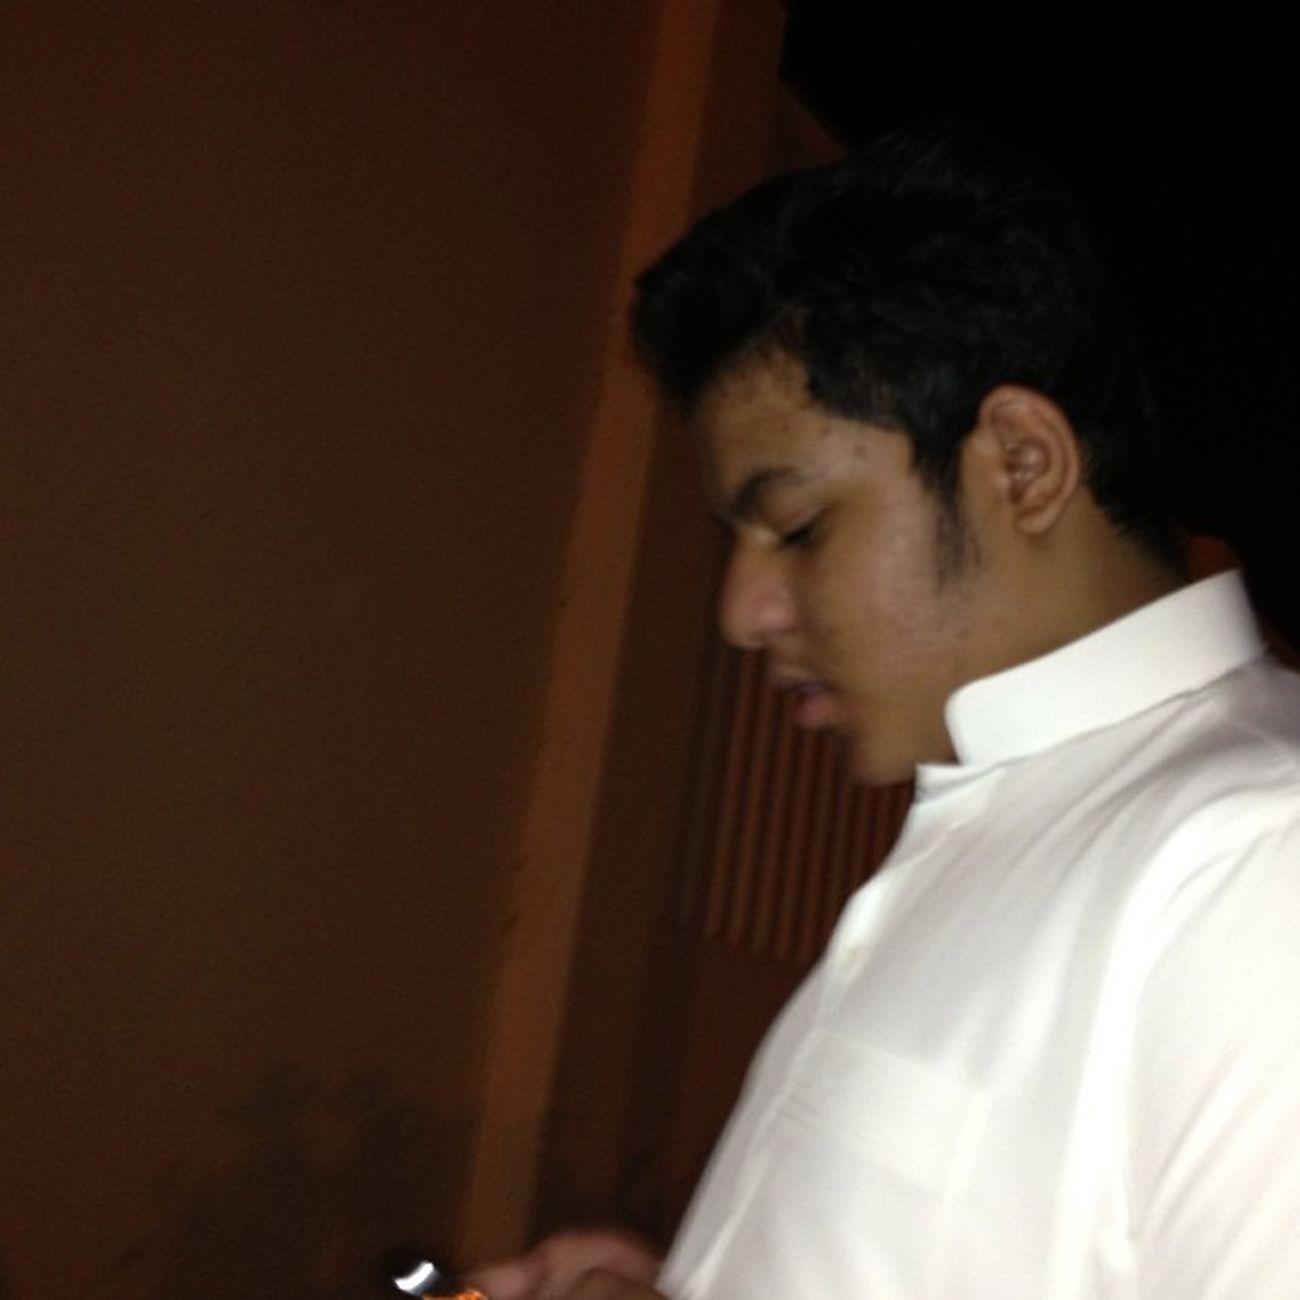 صورني وانا مدري